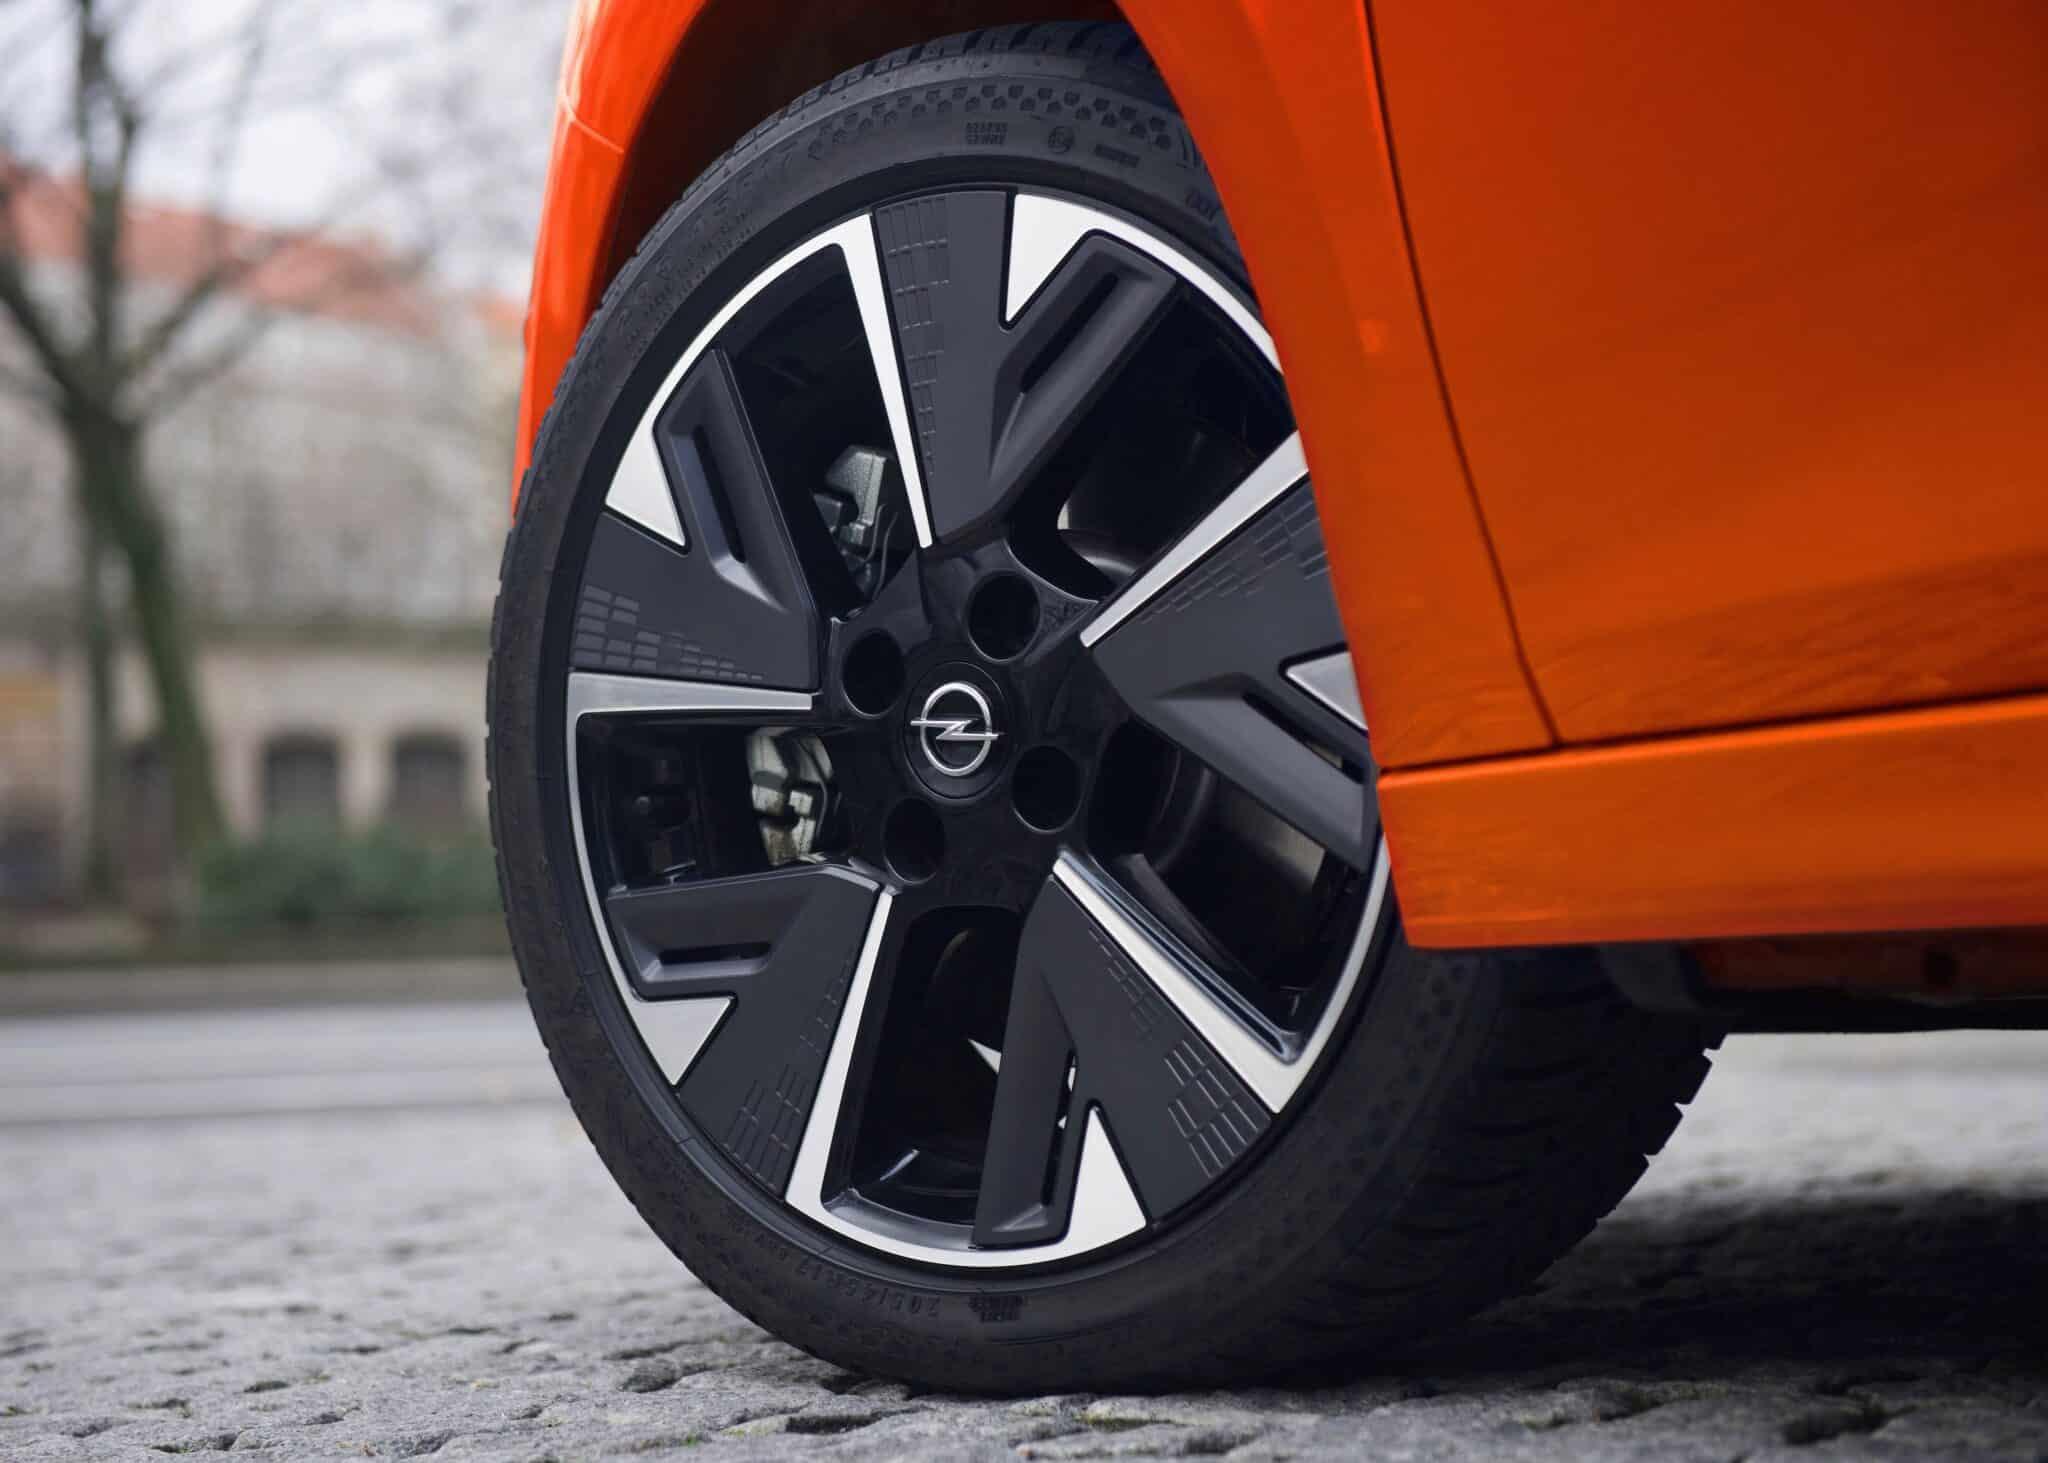 Opel Corsa E – ein Auto ohne Überraschungen? | 33 Opel Corsa e 511284 min scaled